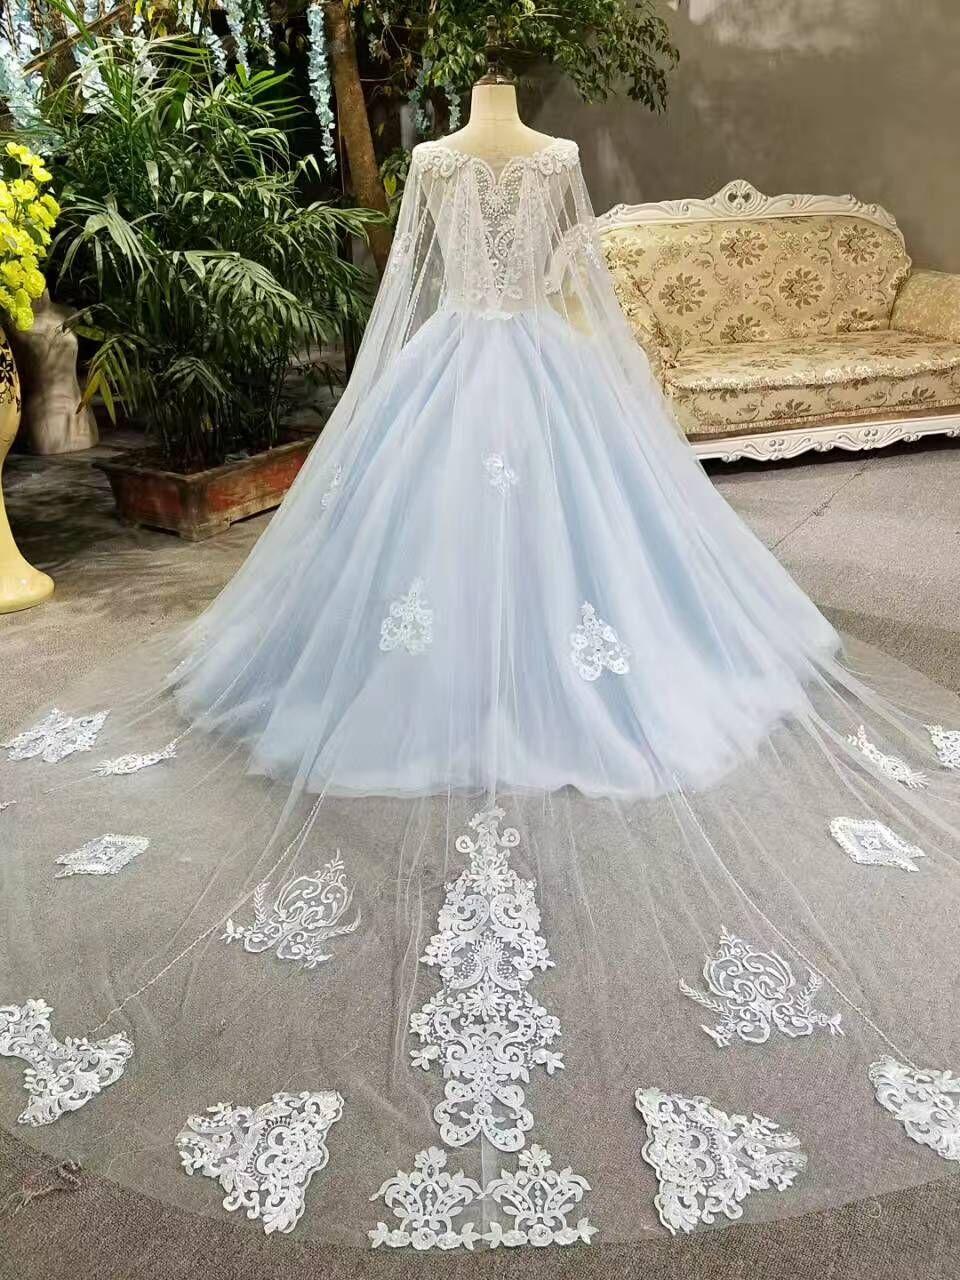 2017 Imagini reale Albastru rochie de mireasa rochie de mireasa lunga - Rochii de mireasa - Fotografie 2